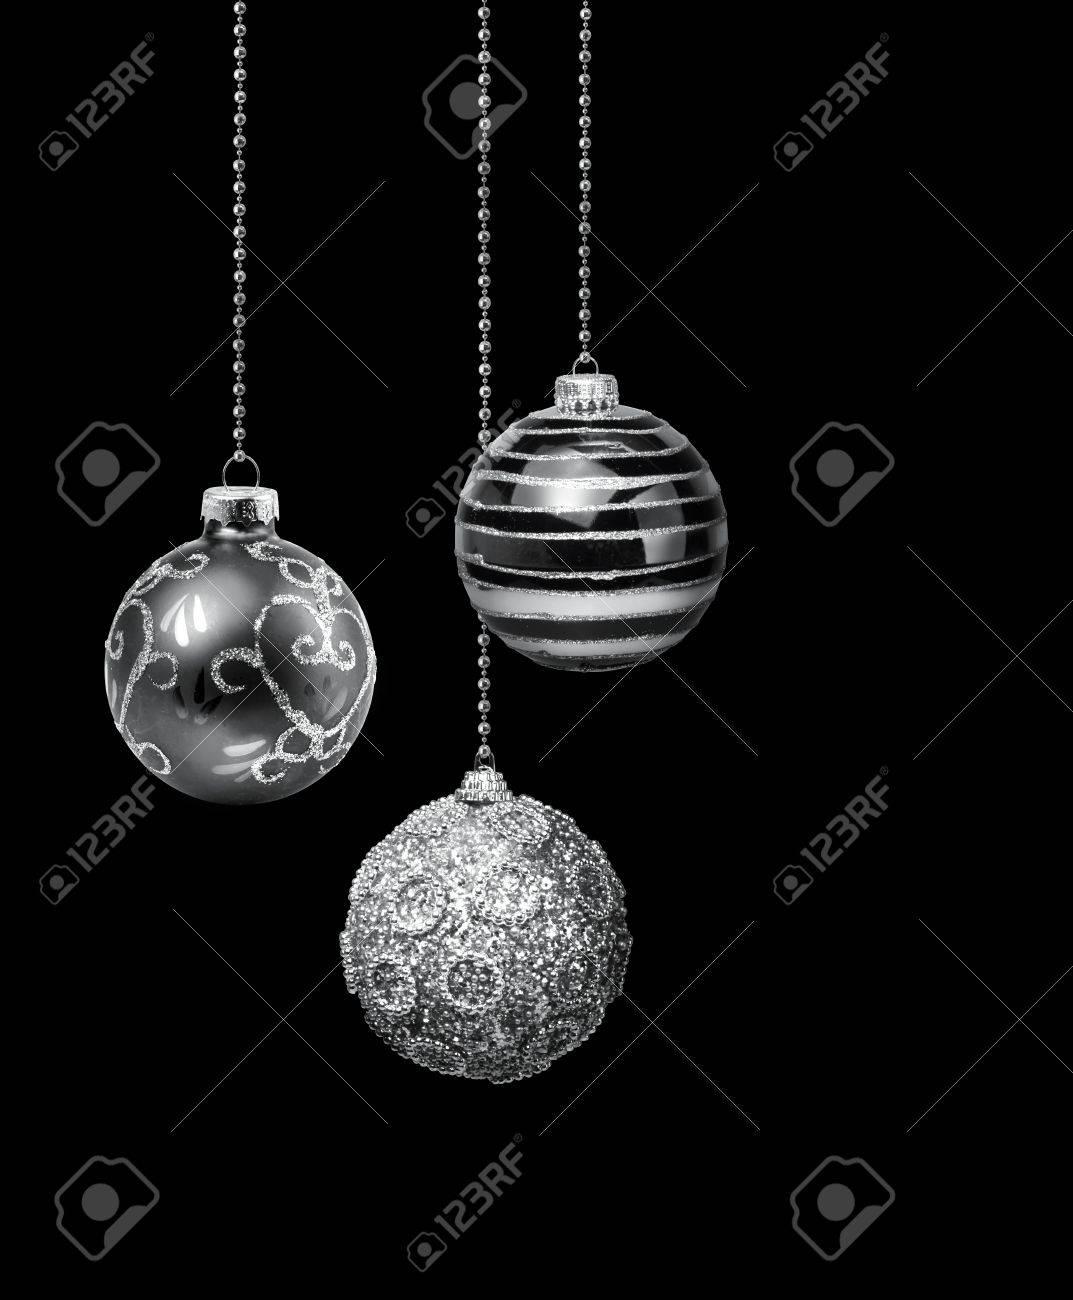 Three Silver Decoration Christmas Balls Hanging Black Background